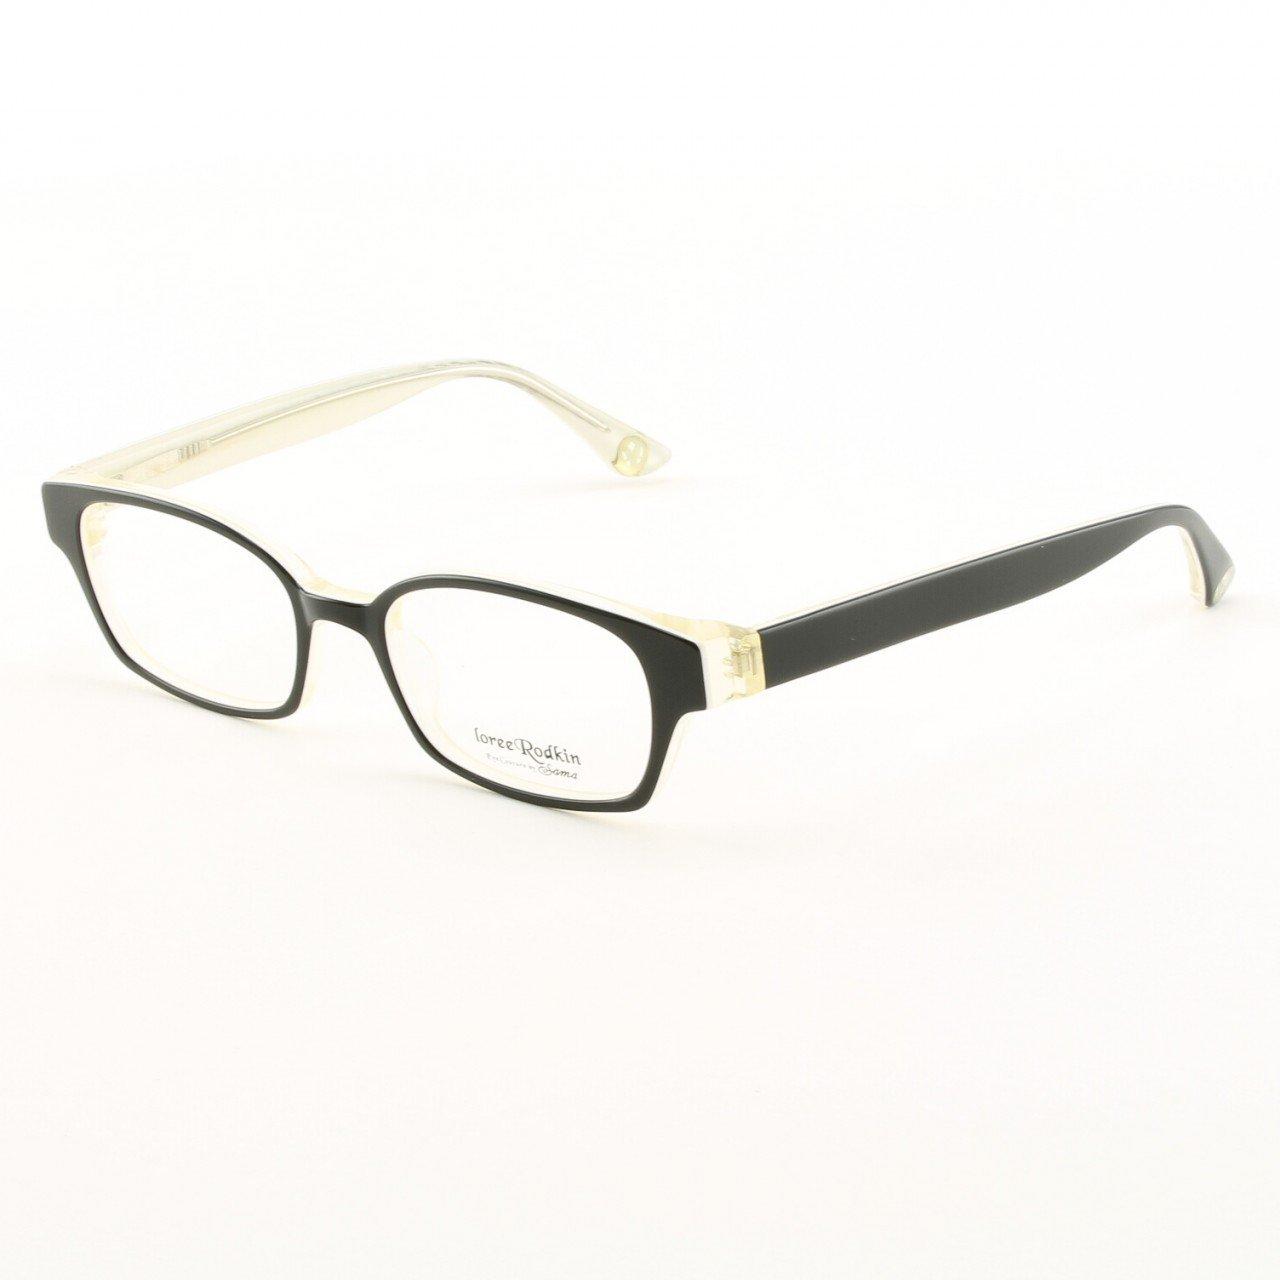 Loree Rodkin Evan Eyeglasses by Sama Col. Black with Clear Lenses